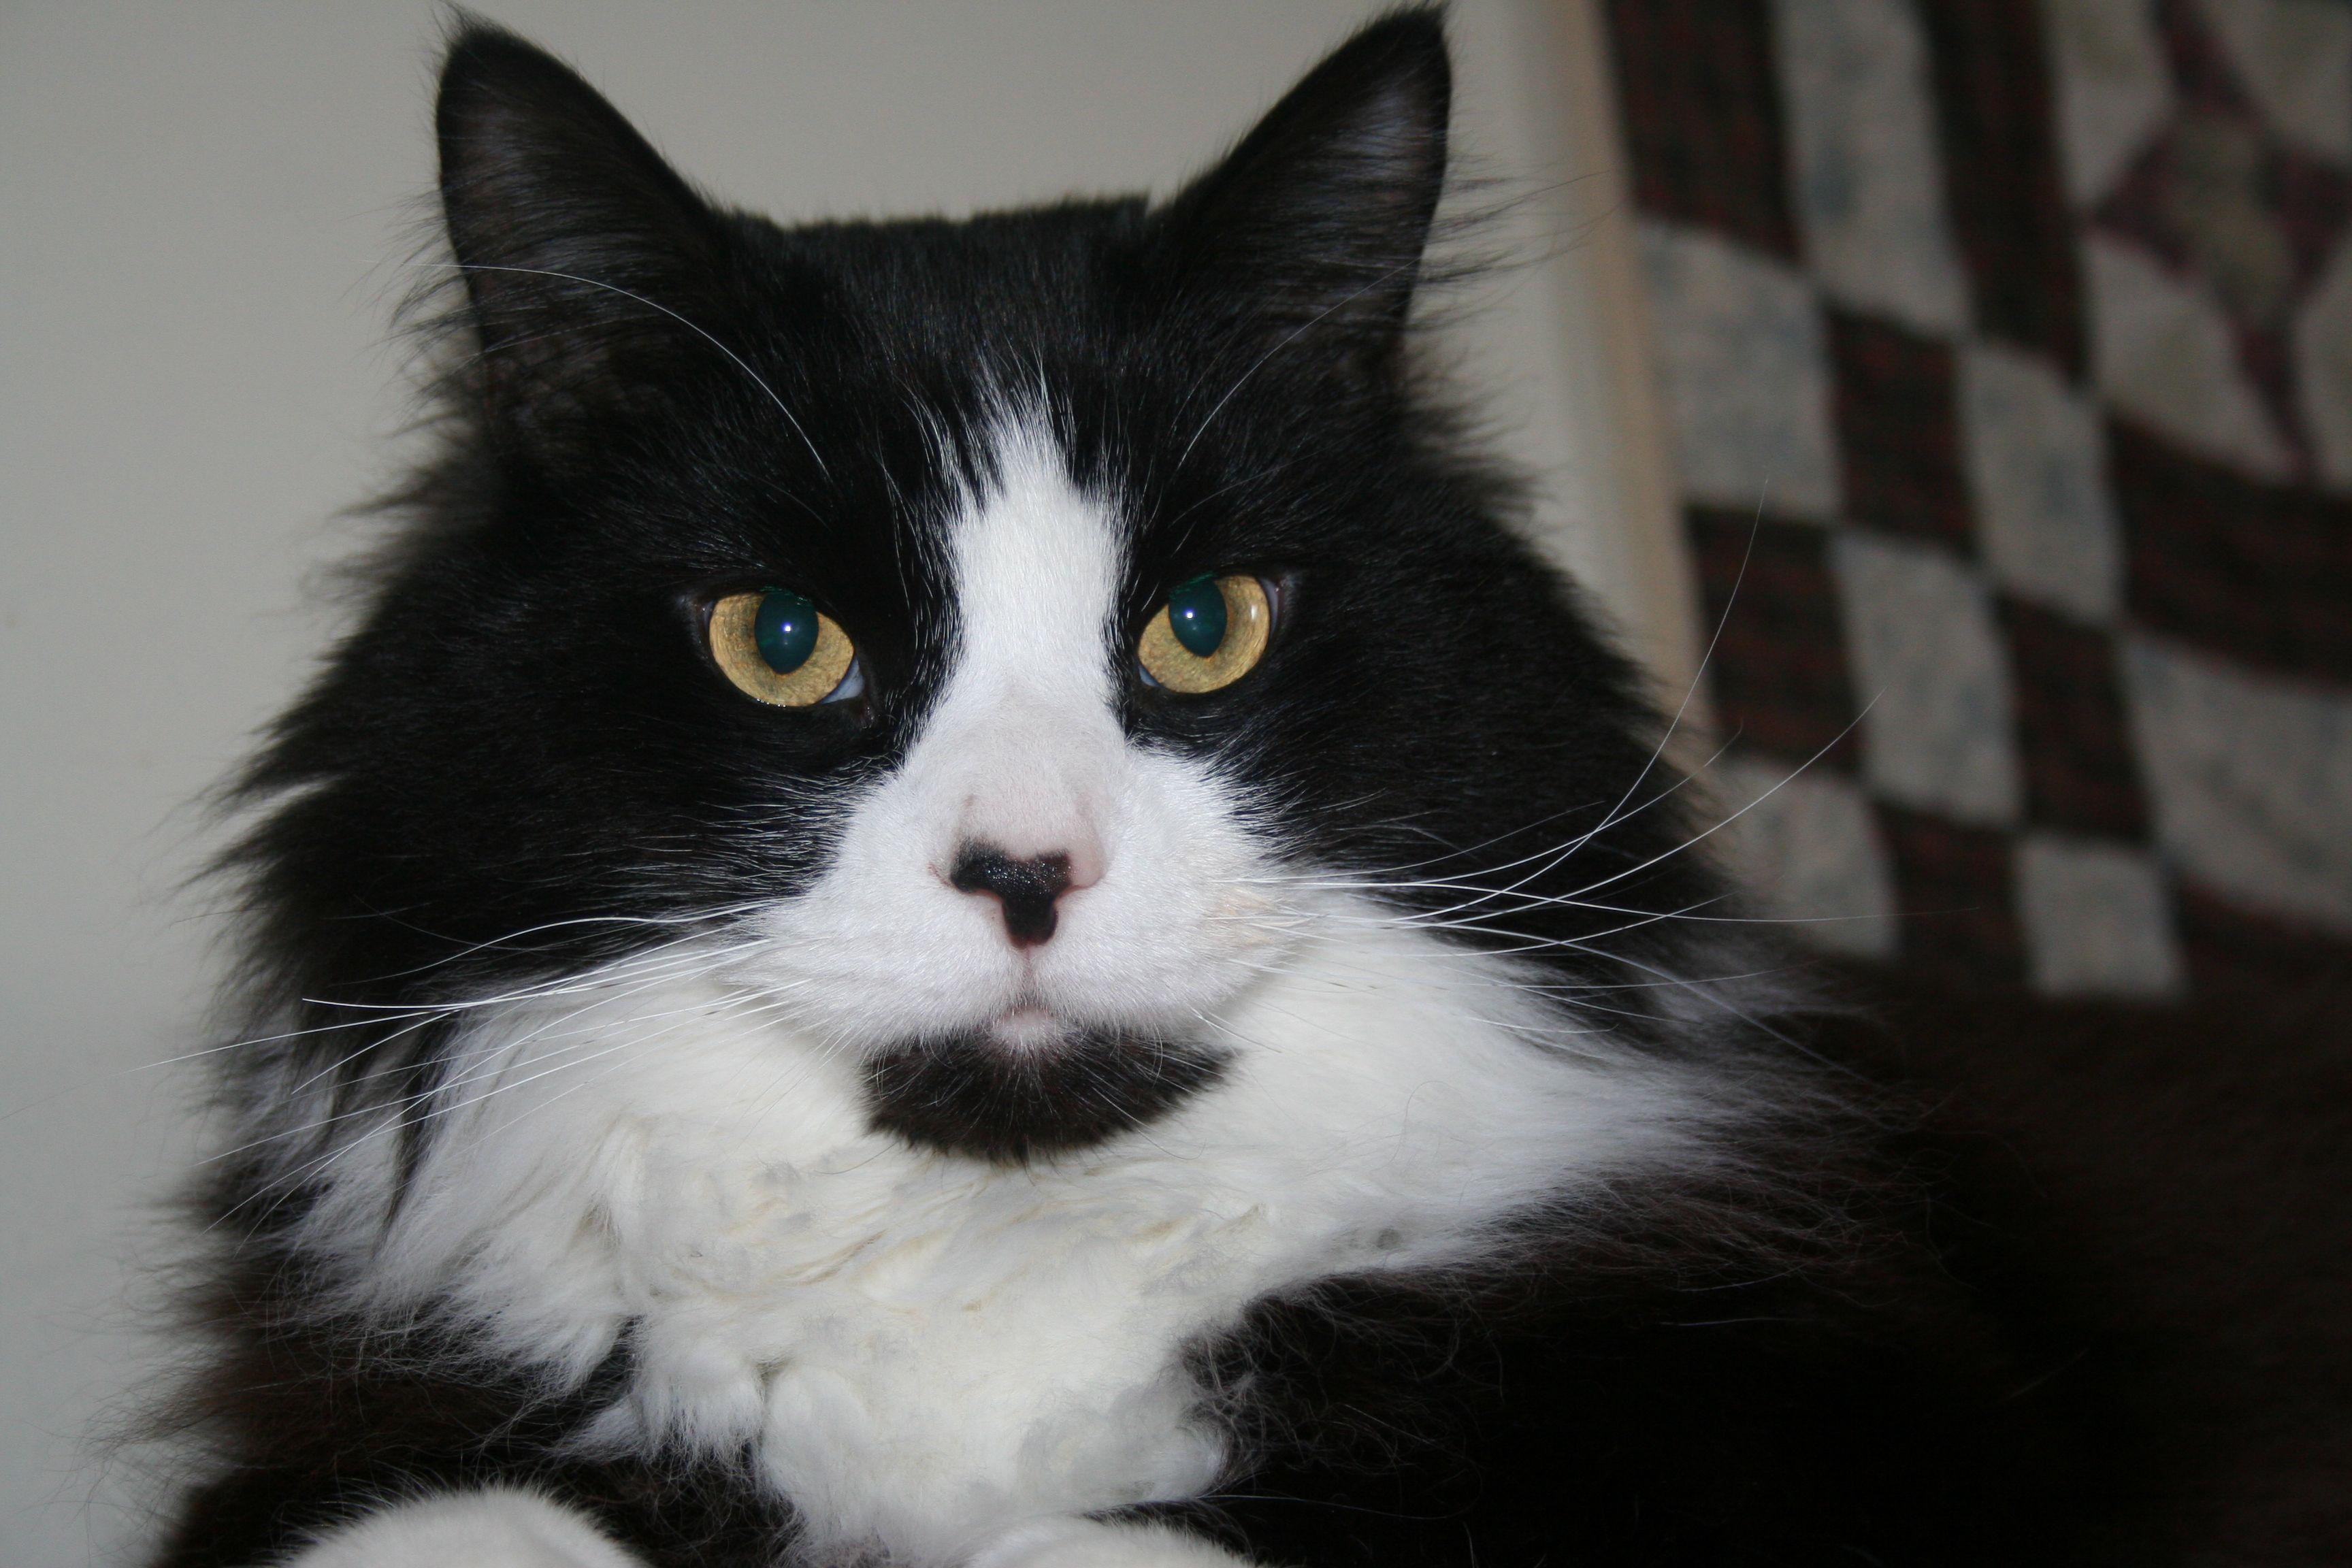 tuxedo cat Cats, kittens, Crazy cats, Cute animals